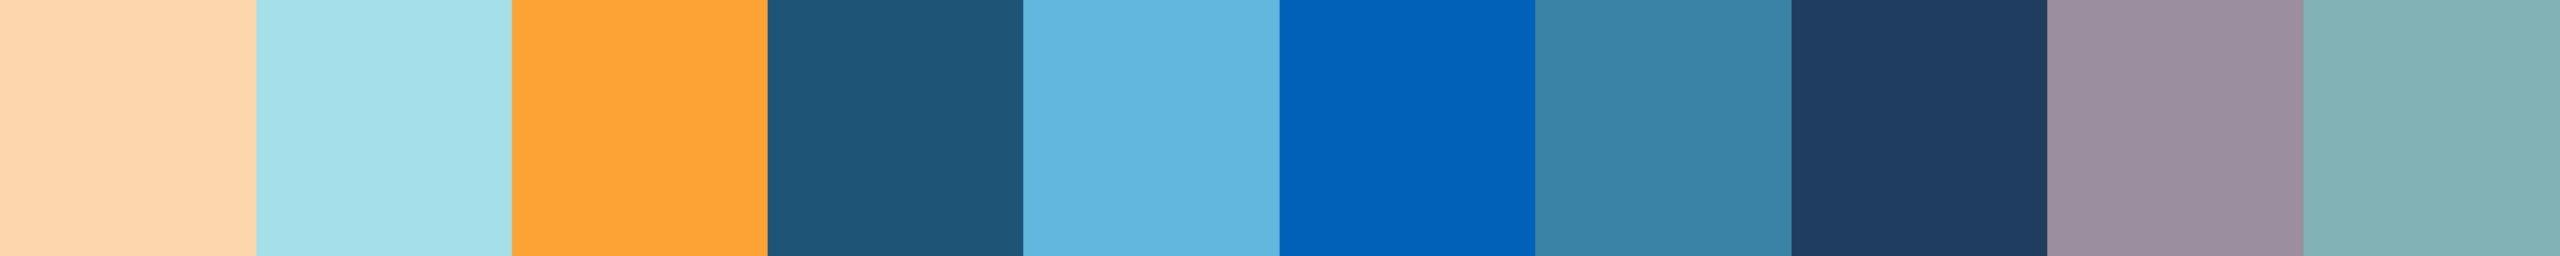 204 Axotopia Color Palette